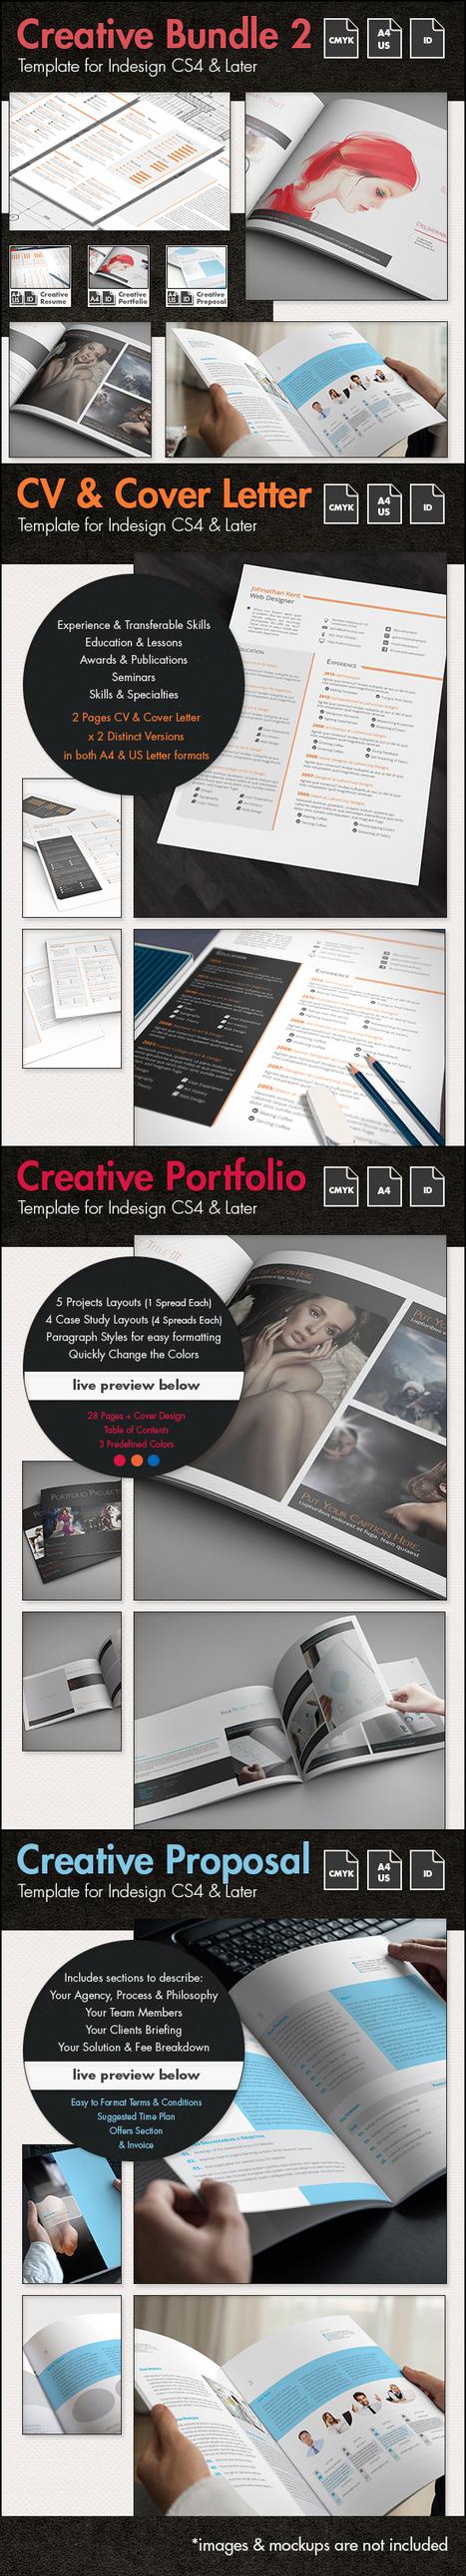 Creative Bundle r2 - US Letter & A4 | About Art & Creativity | Scoop.it